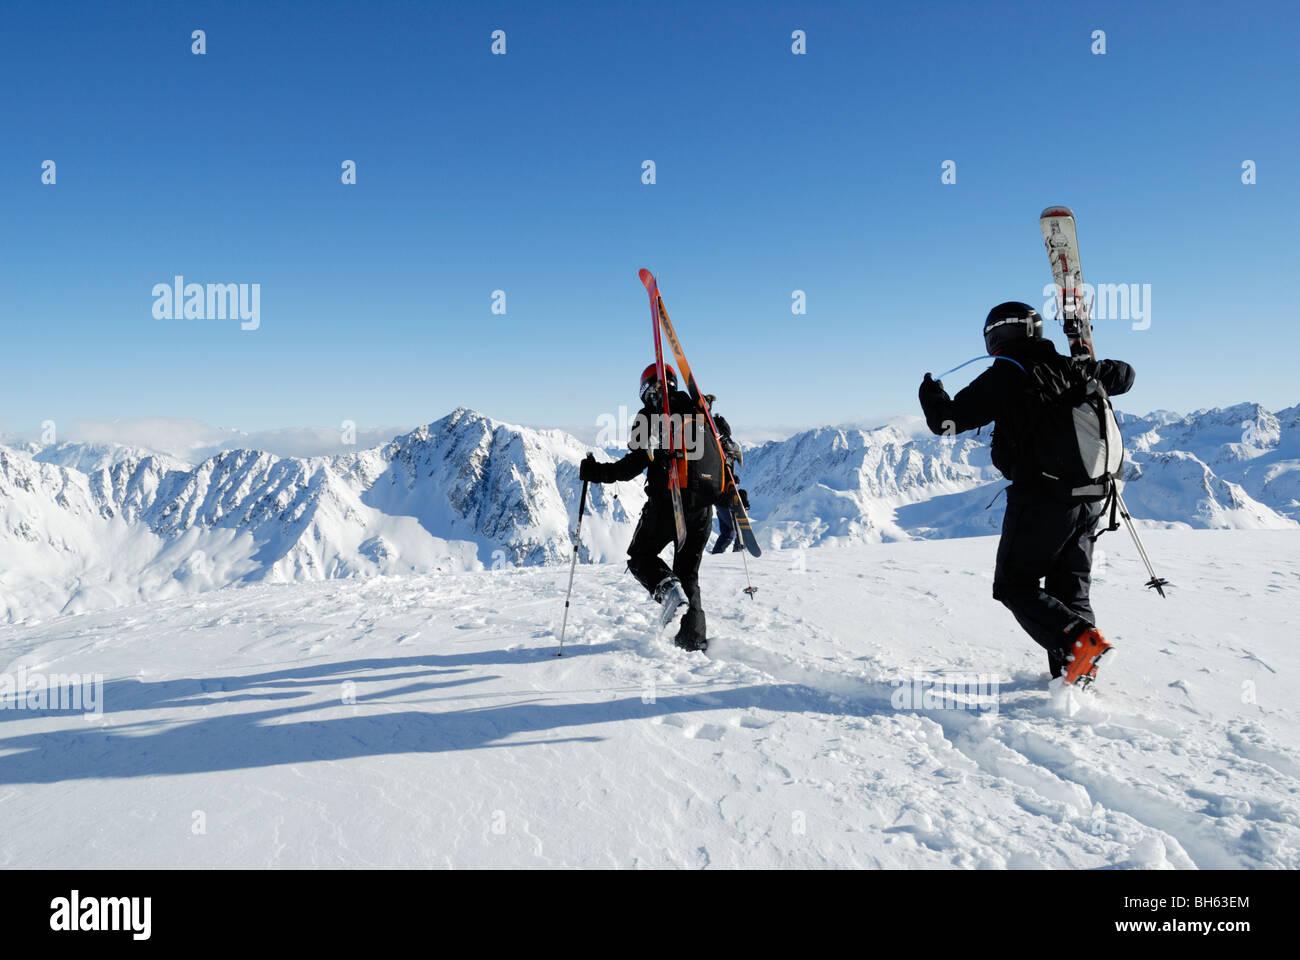 Two skiers walking and carrying their skis on off-piste terrain, Gemsstock, Andermatt, Switzerland - Stock Image